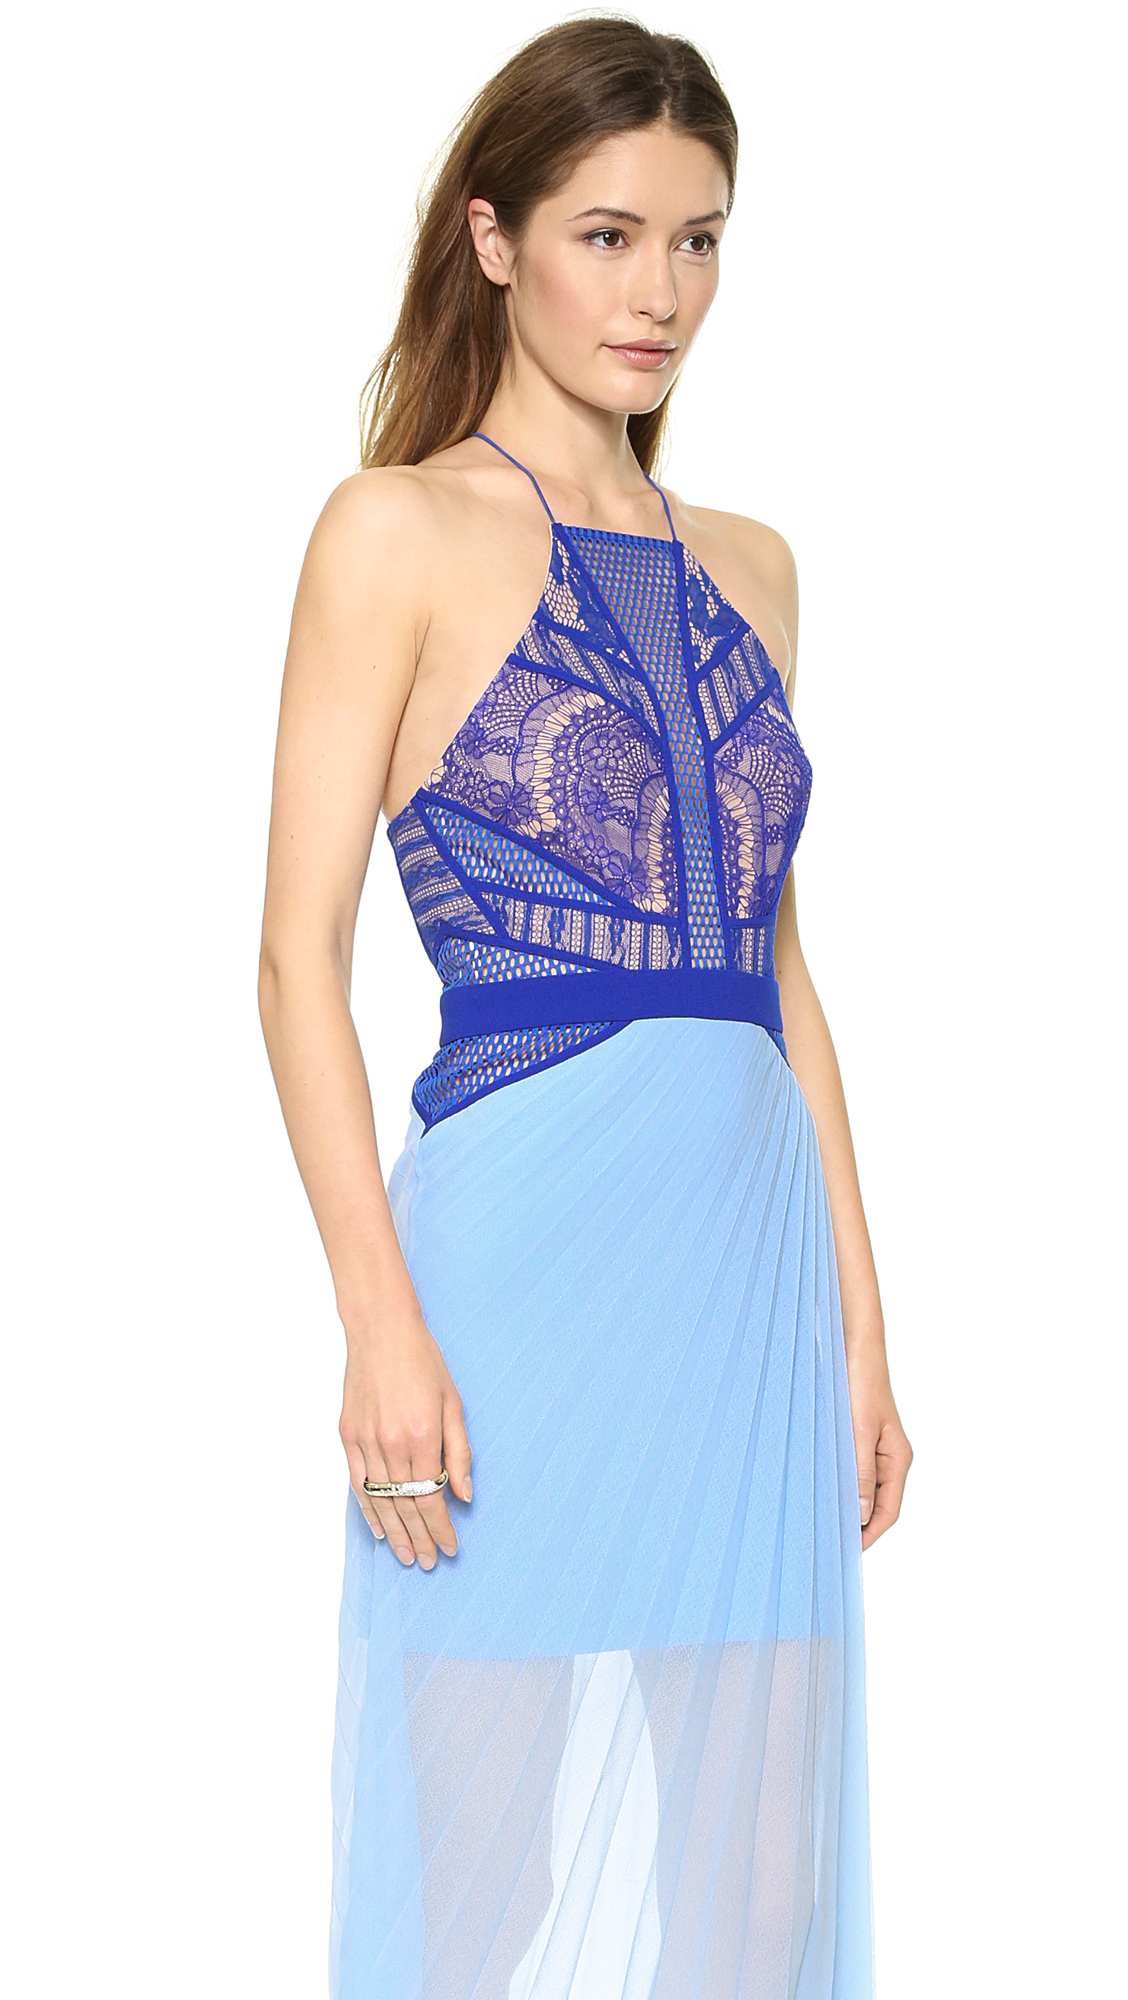 Lyst - Three Floor Fan Club Dress - Cobalt/Cornflower/Nude in Blue